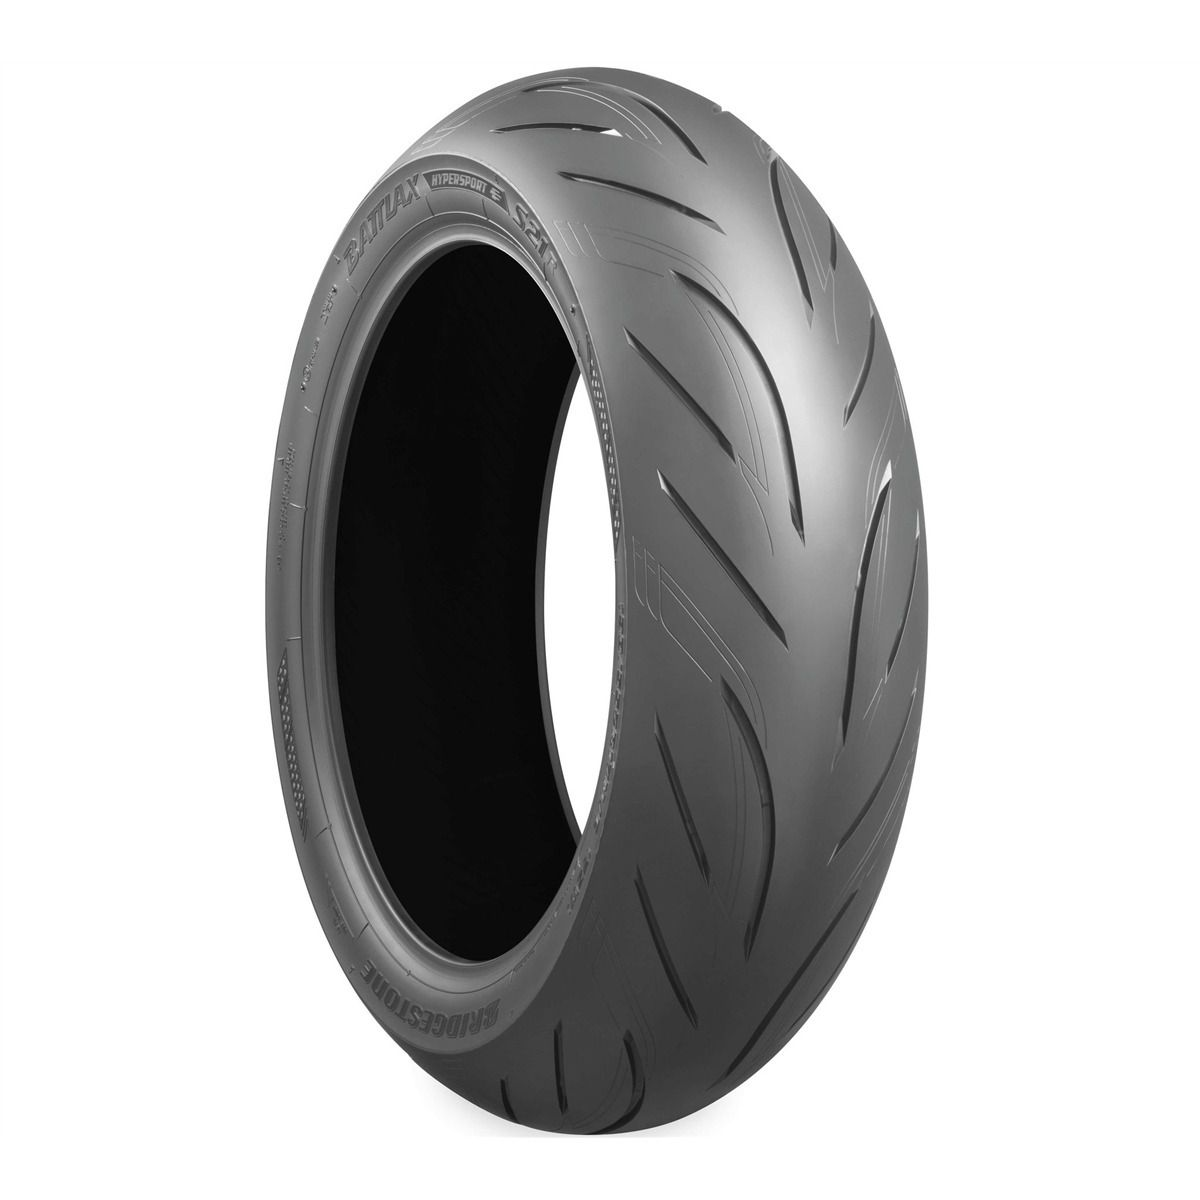 Pneus Bridgestone Battlax S21 120/70 R17 e 190/55 R17